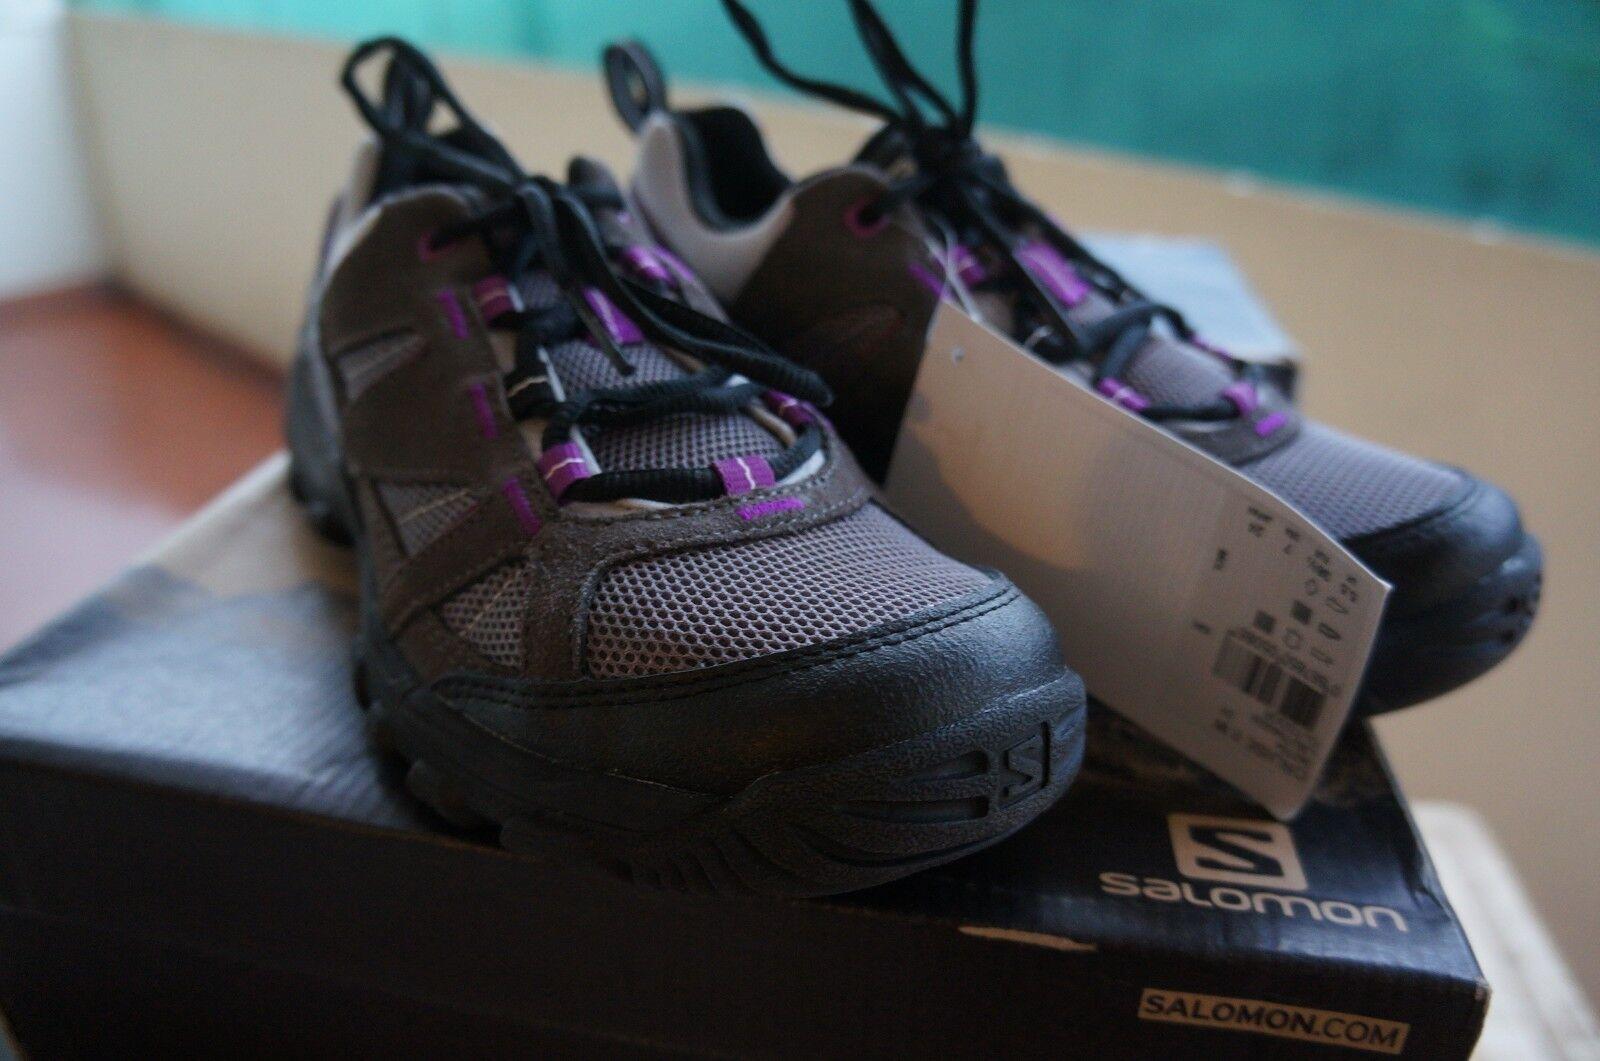 Salomon CRUISE II W Chaussures de Randonnee , 38 2/3 eu , 5.5uk, 7 us, 24 jp